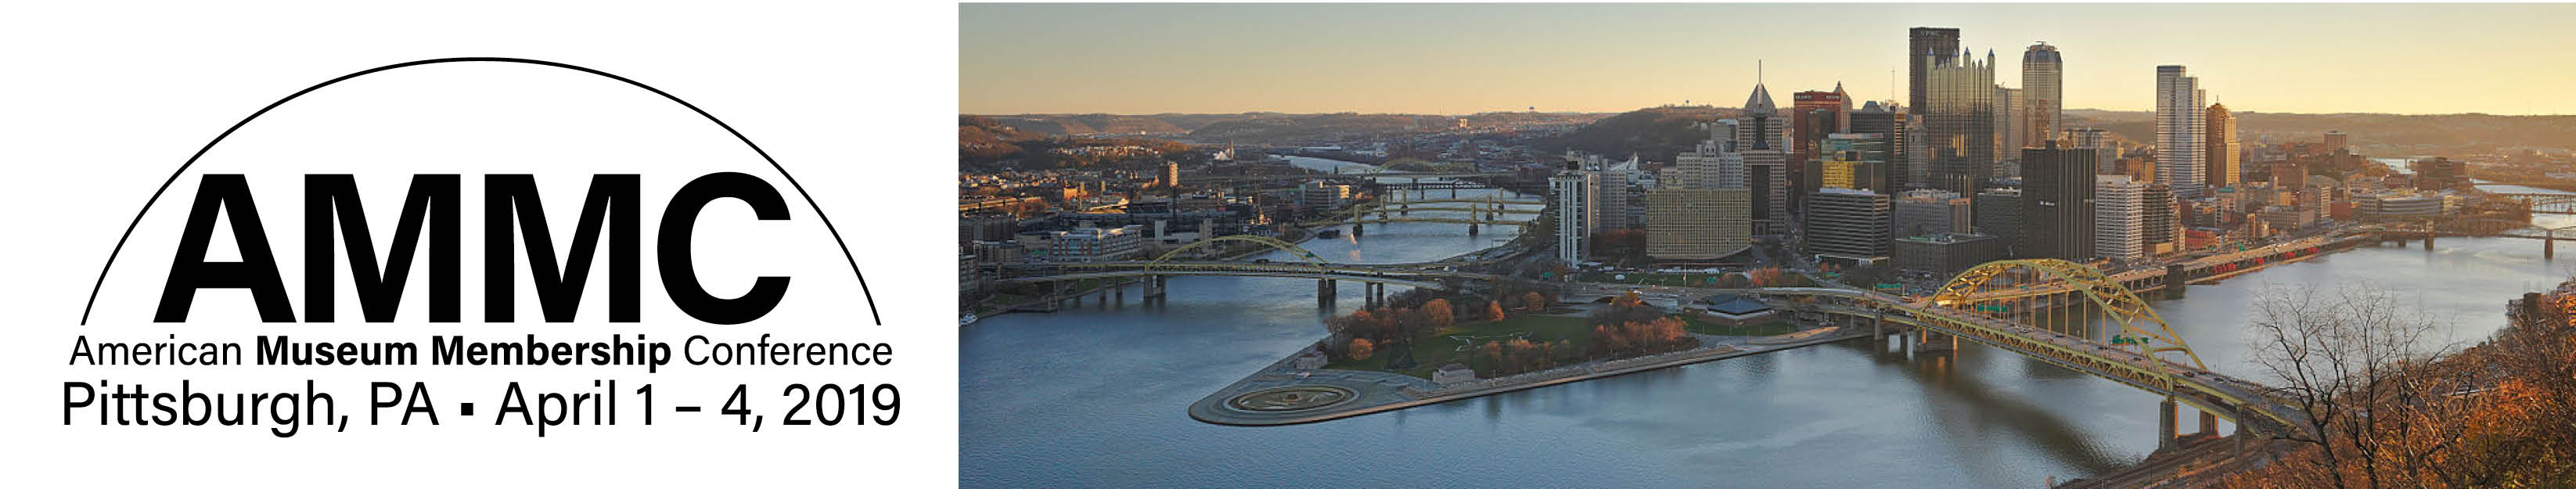 American Museum Membership Conference - Pittsburgh, PA